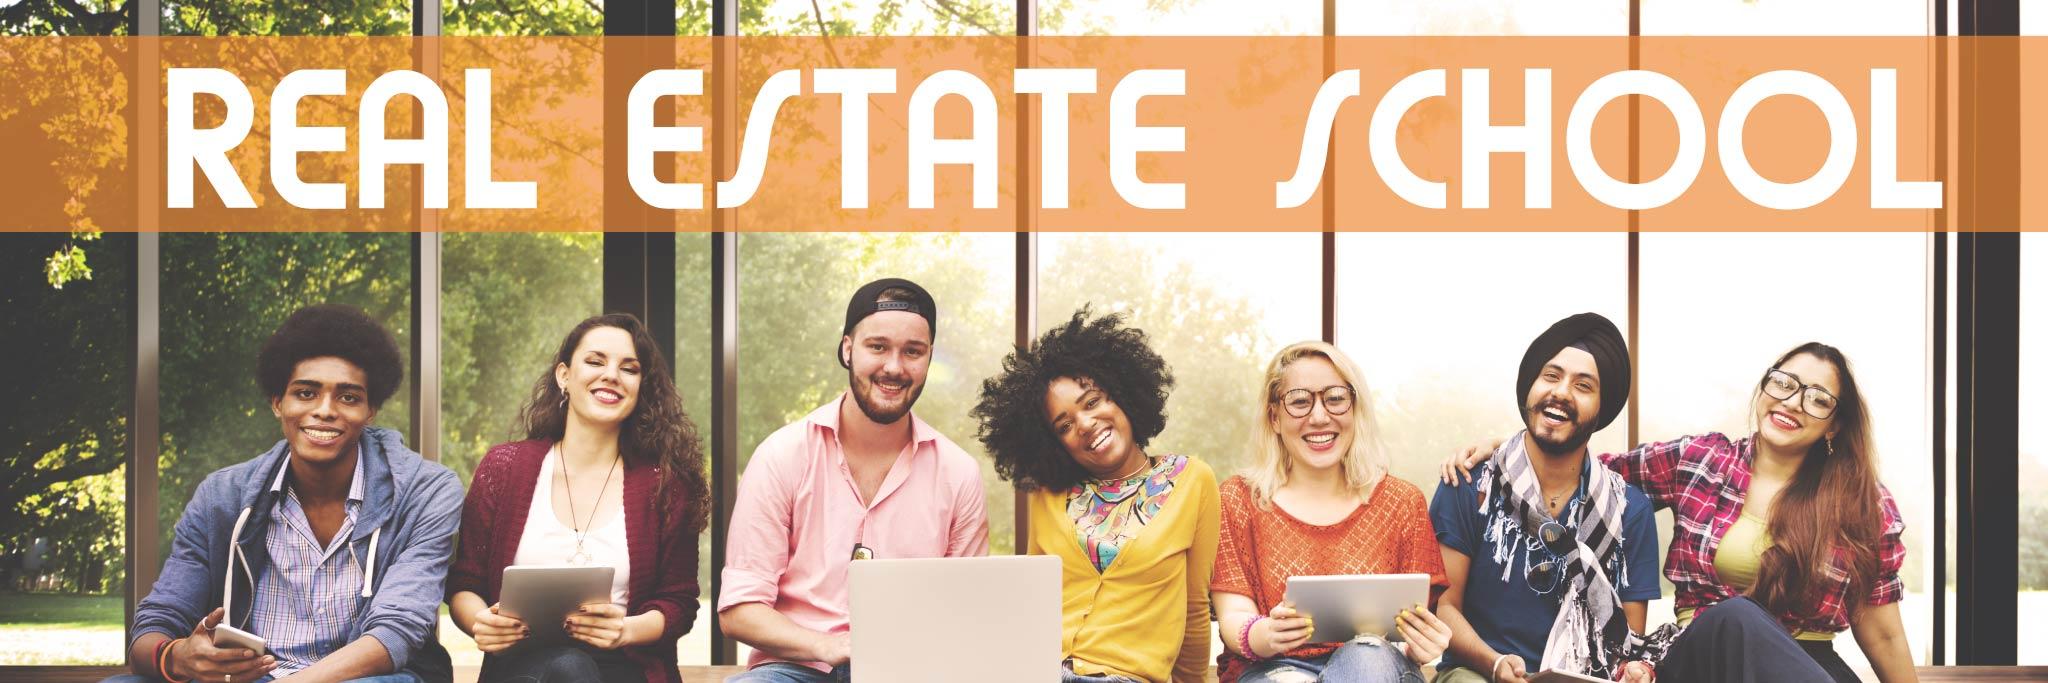 Get-Your-Real-Estate-License-Real-Estate-School-Real-Estate-Classes-Become-a-Real-Estate-Agent